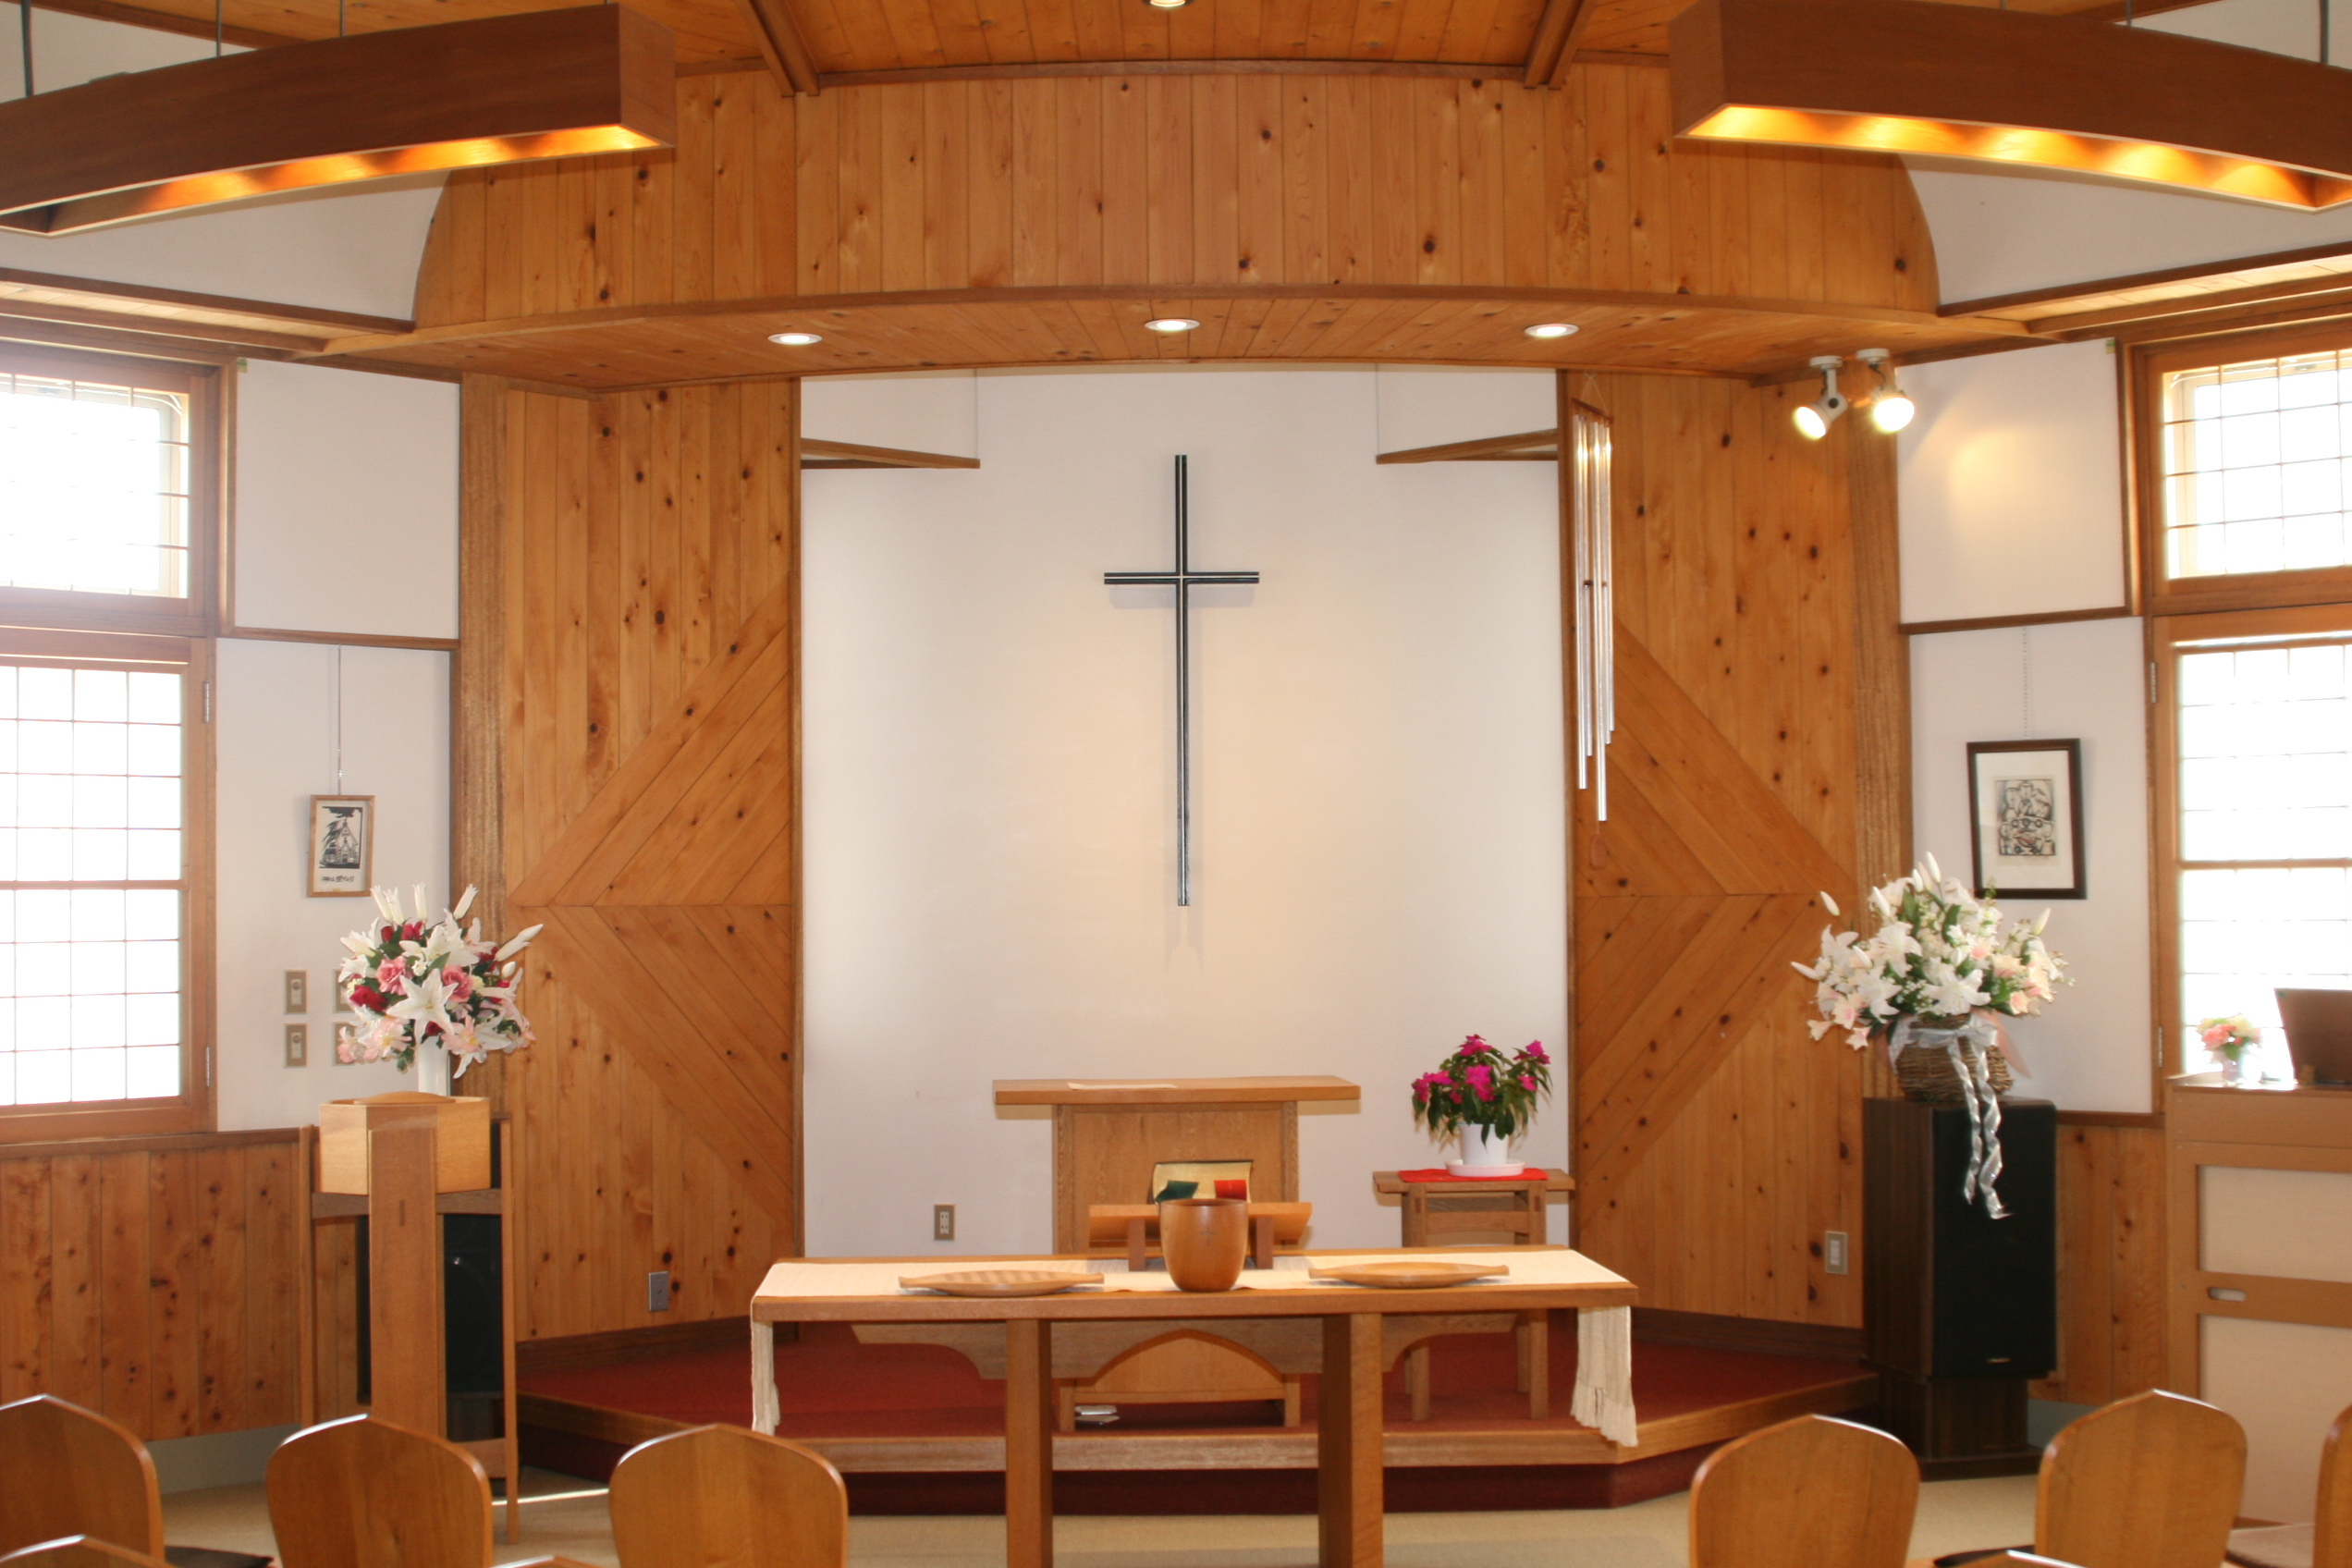 tono baptist church interior 2006